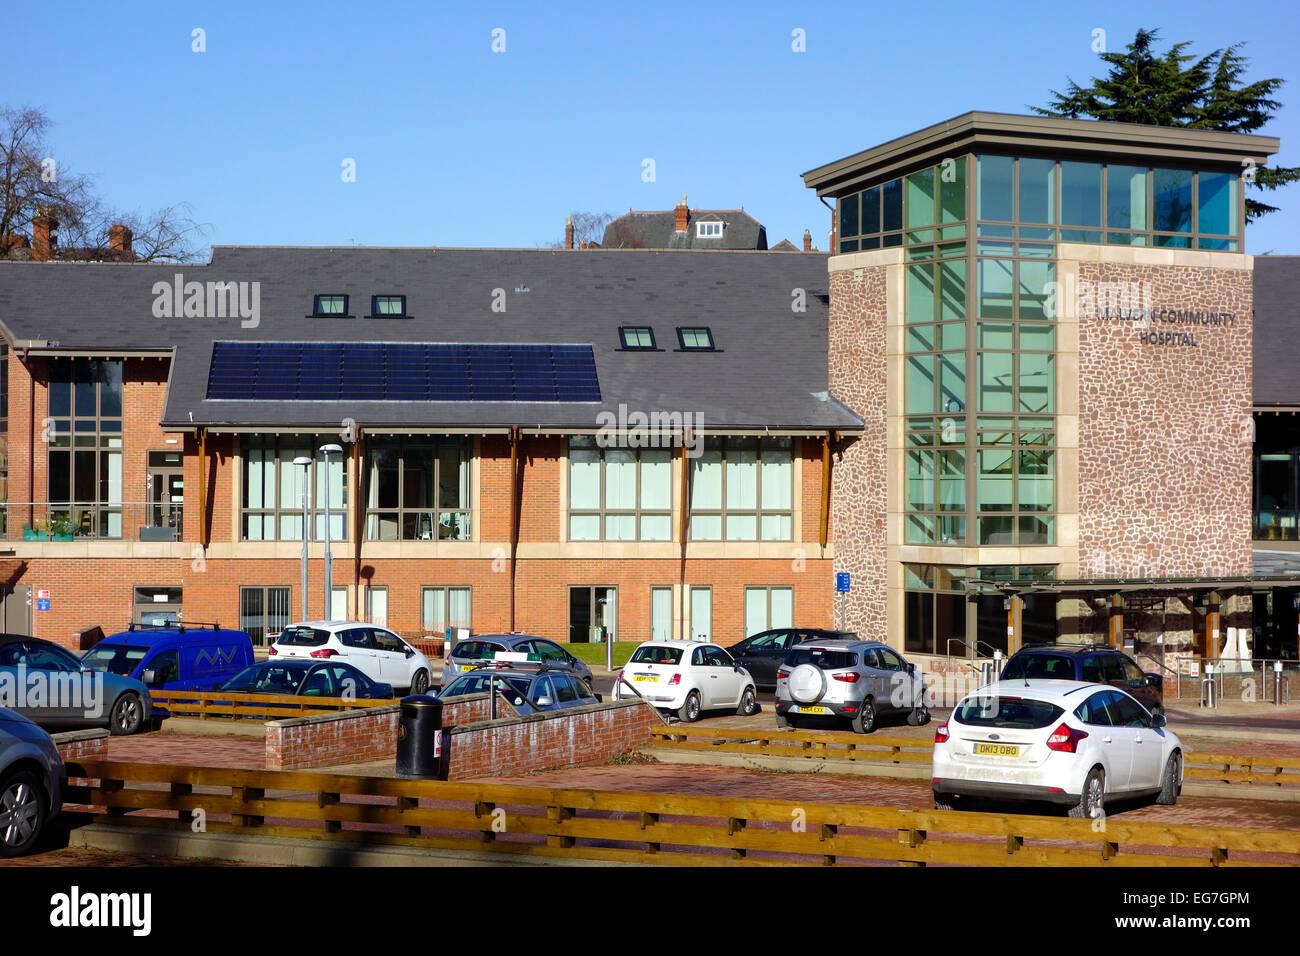 Malvern NHS Community Hospital, Worcester Road, Malvern Link, Worcestershire, England, UK - Stock Image